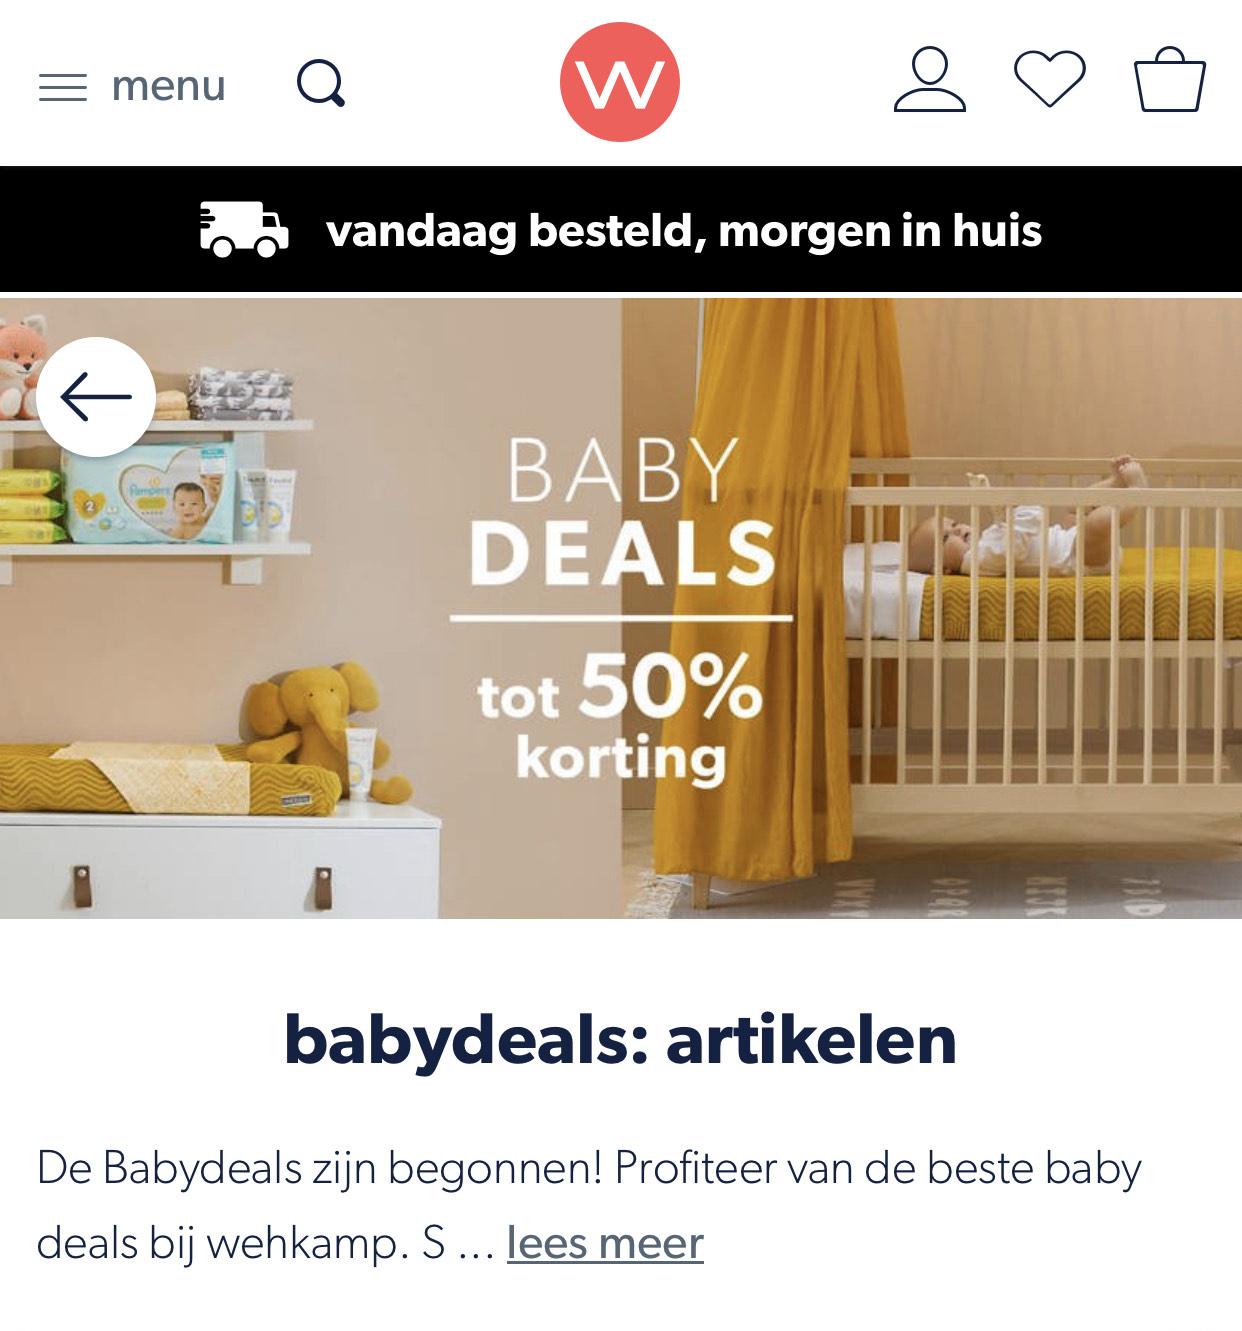 Babydeals tot 50% korting